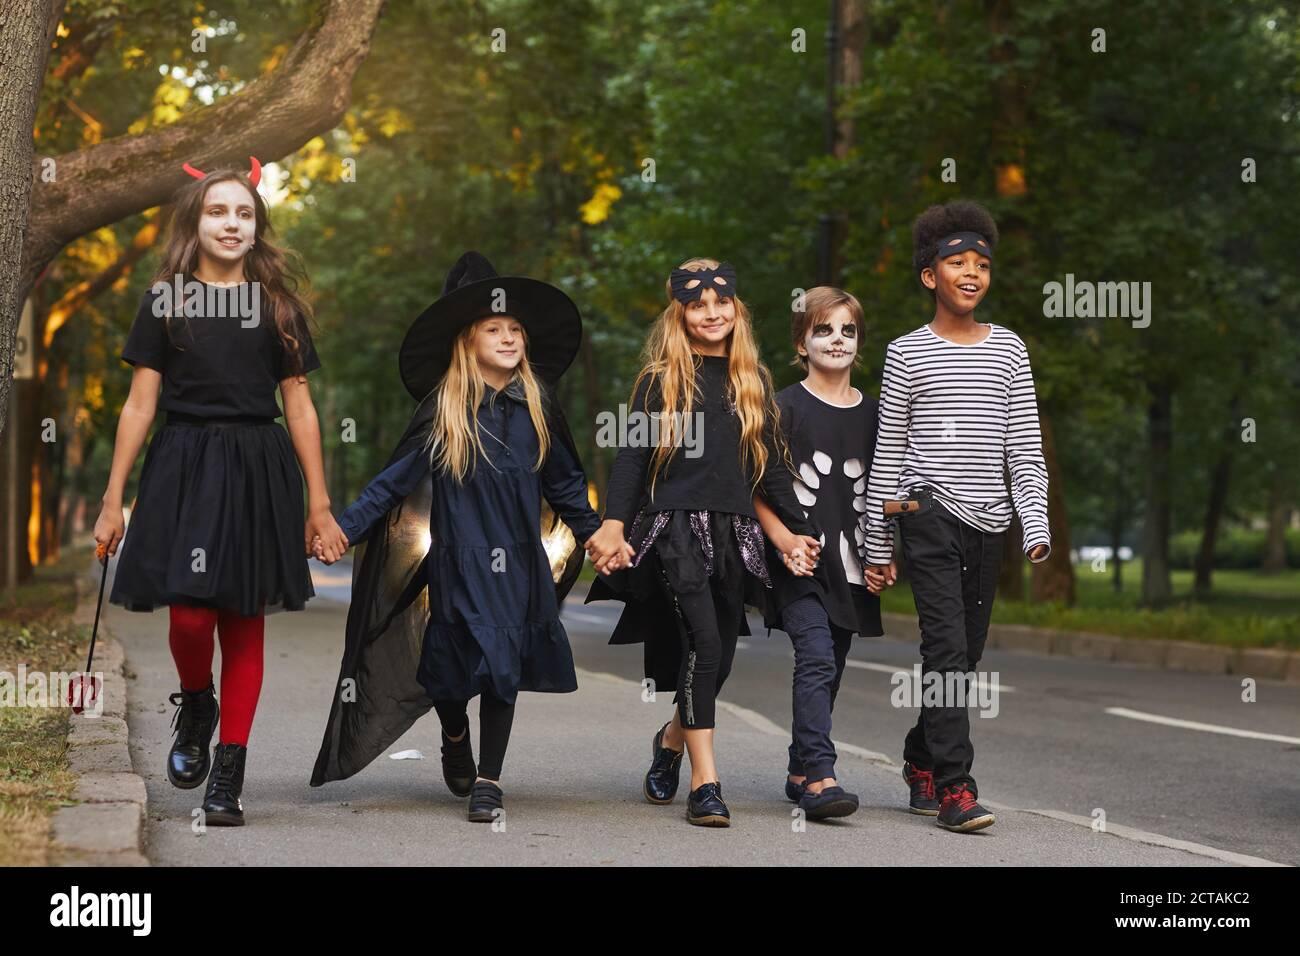 Retrato completo de un grupo multiétnico de niños que caminan street mientras truco o tratar en Halloween Foto de stock